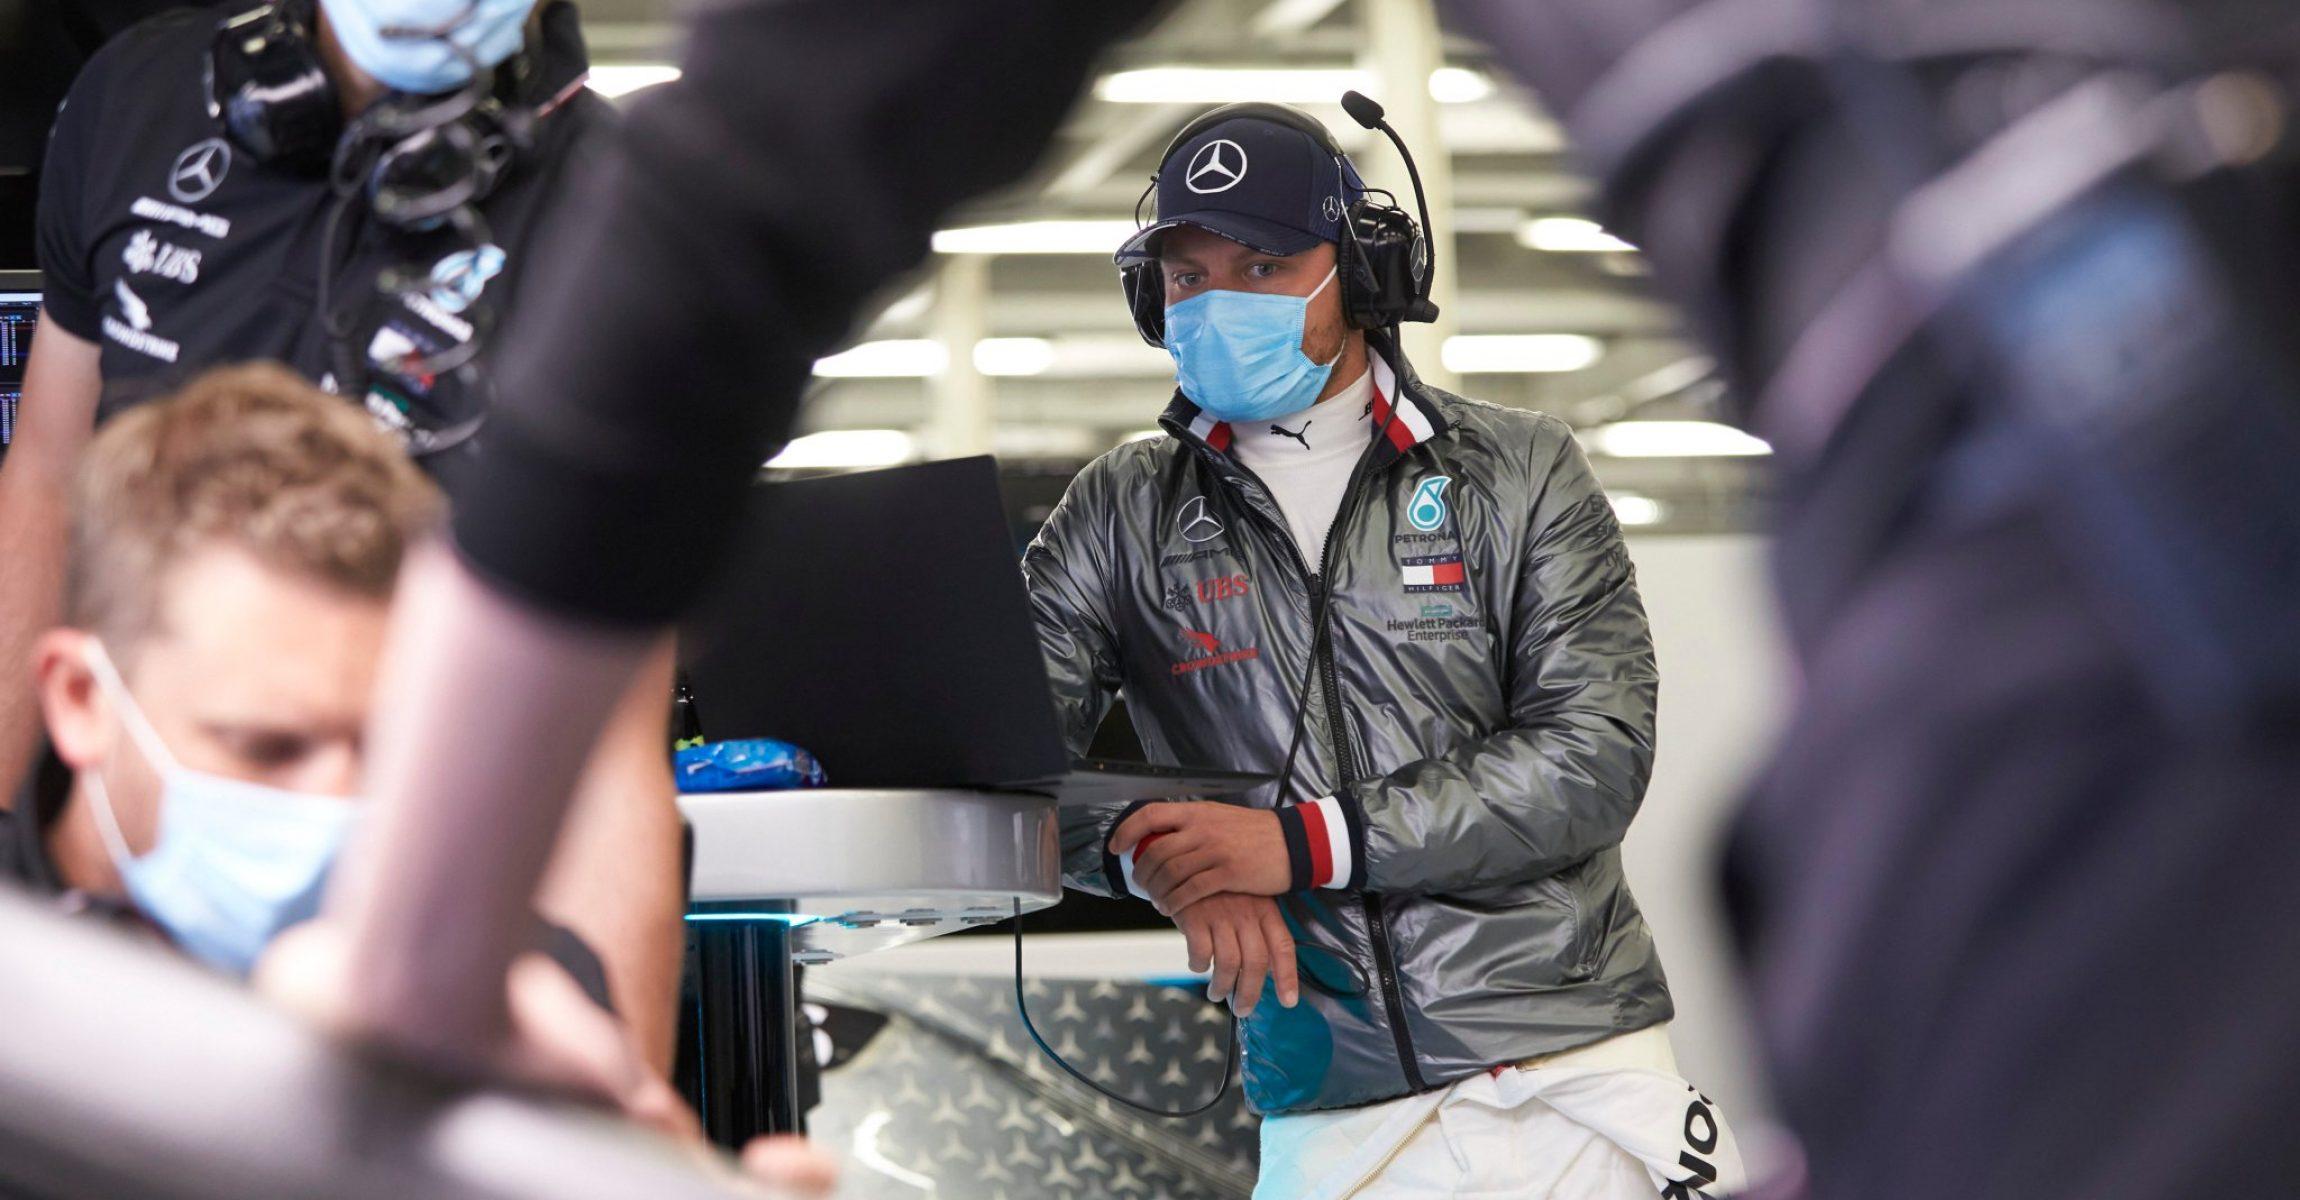 Valtteri Bottas Mercedes facemask